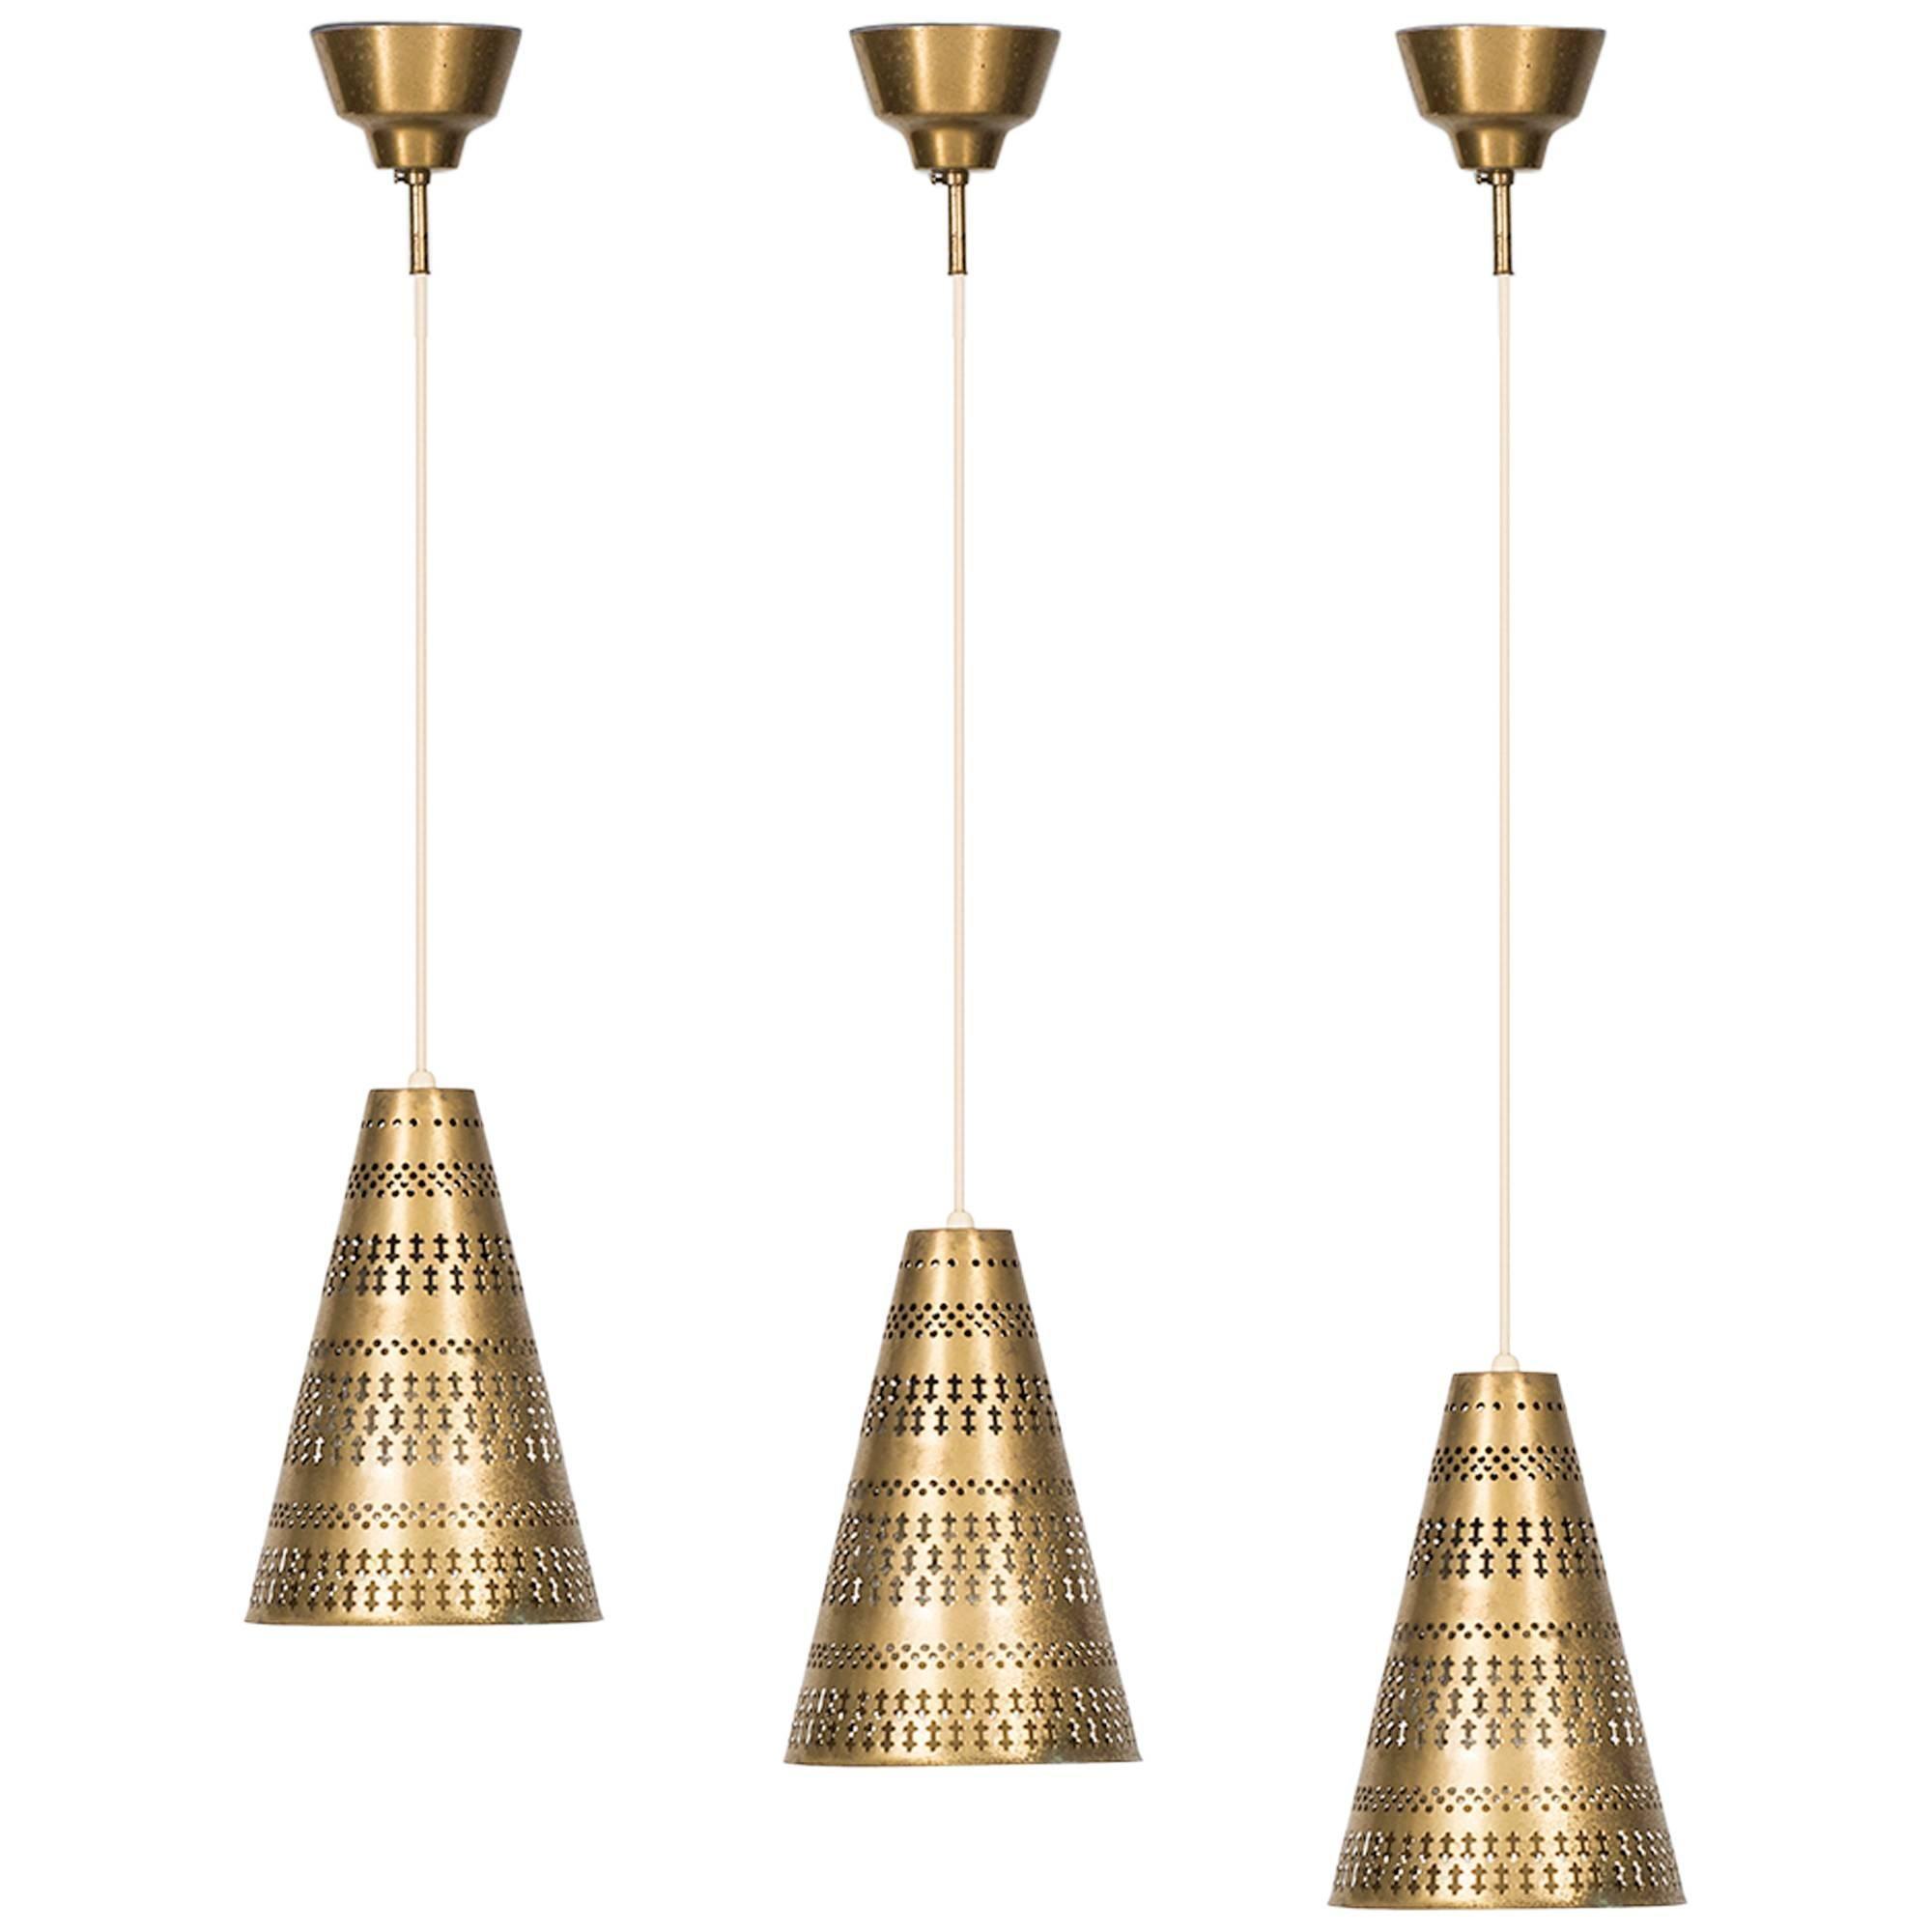 Hans BergströM Ceiling Lamps by Ateljé Lyktan in Åhus, Sweden